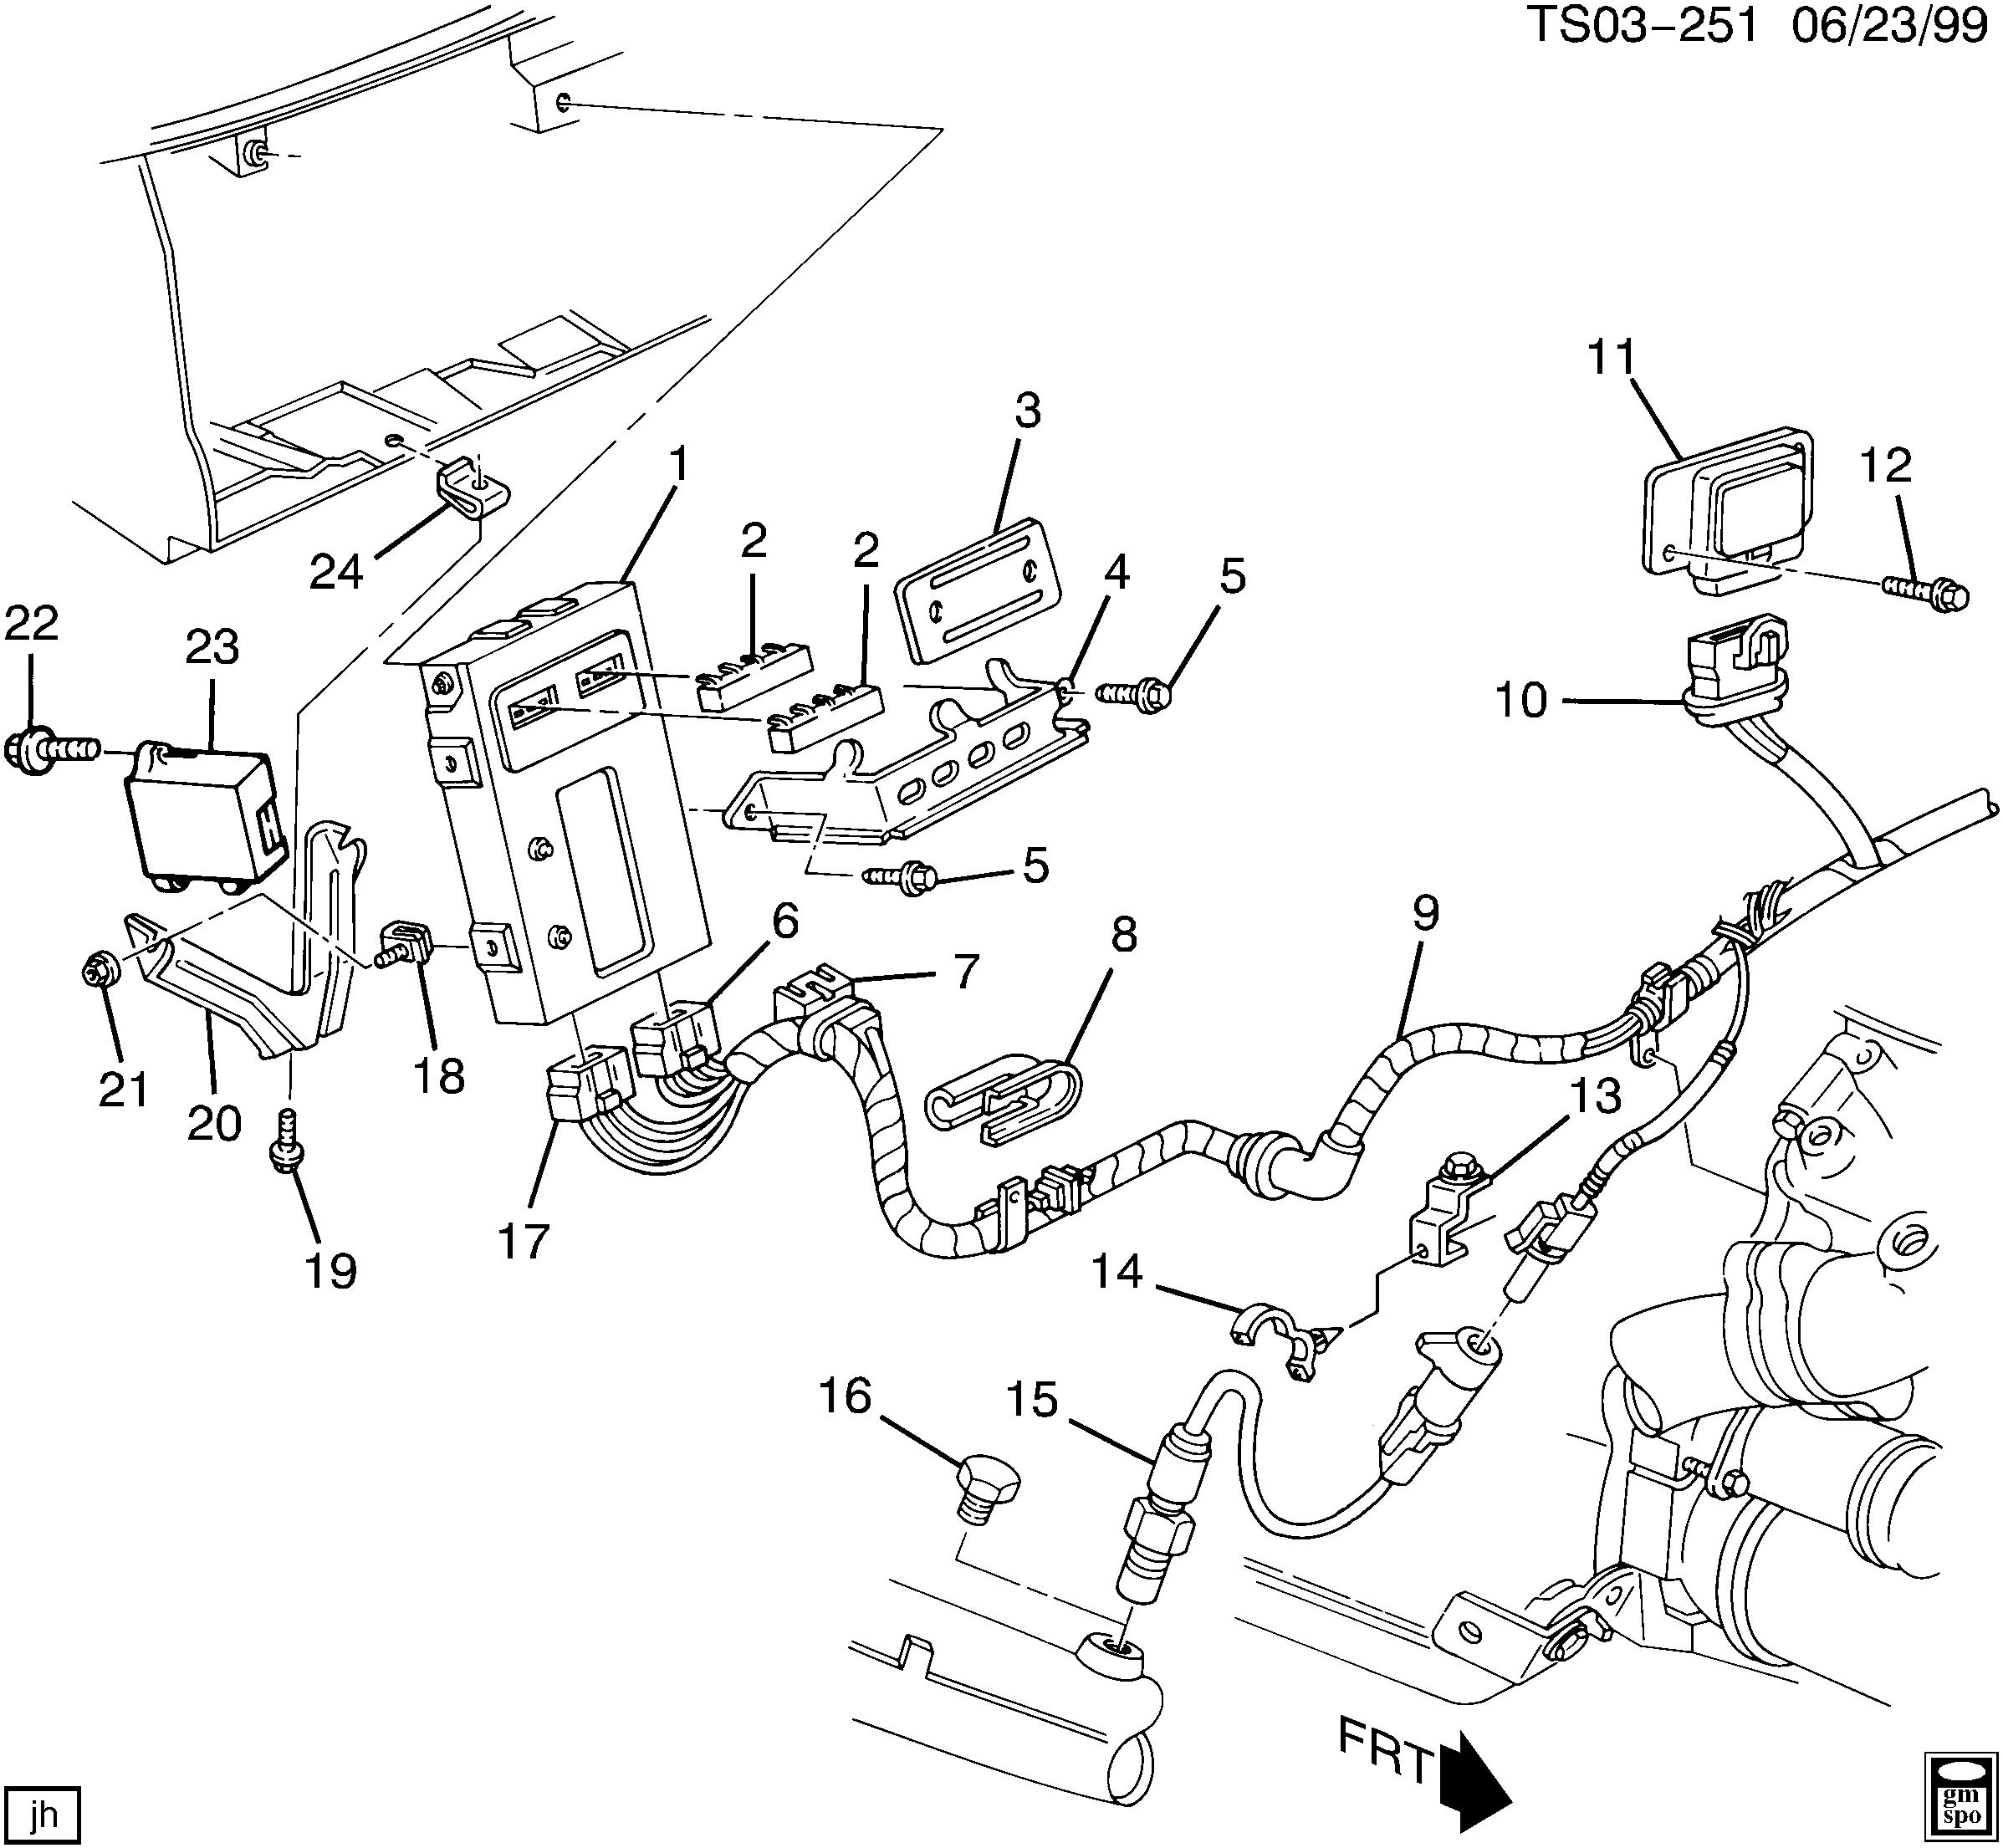 GMC VADA 2WD - S E.C.M. MODULE & WIRING HARNESS (LL2/2.8R ... Gmc Typhoon Ecm Wiring Diagram on